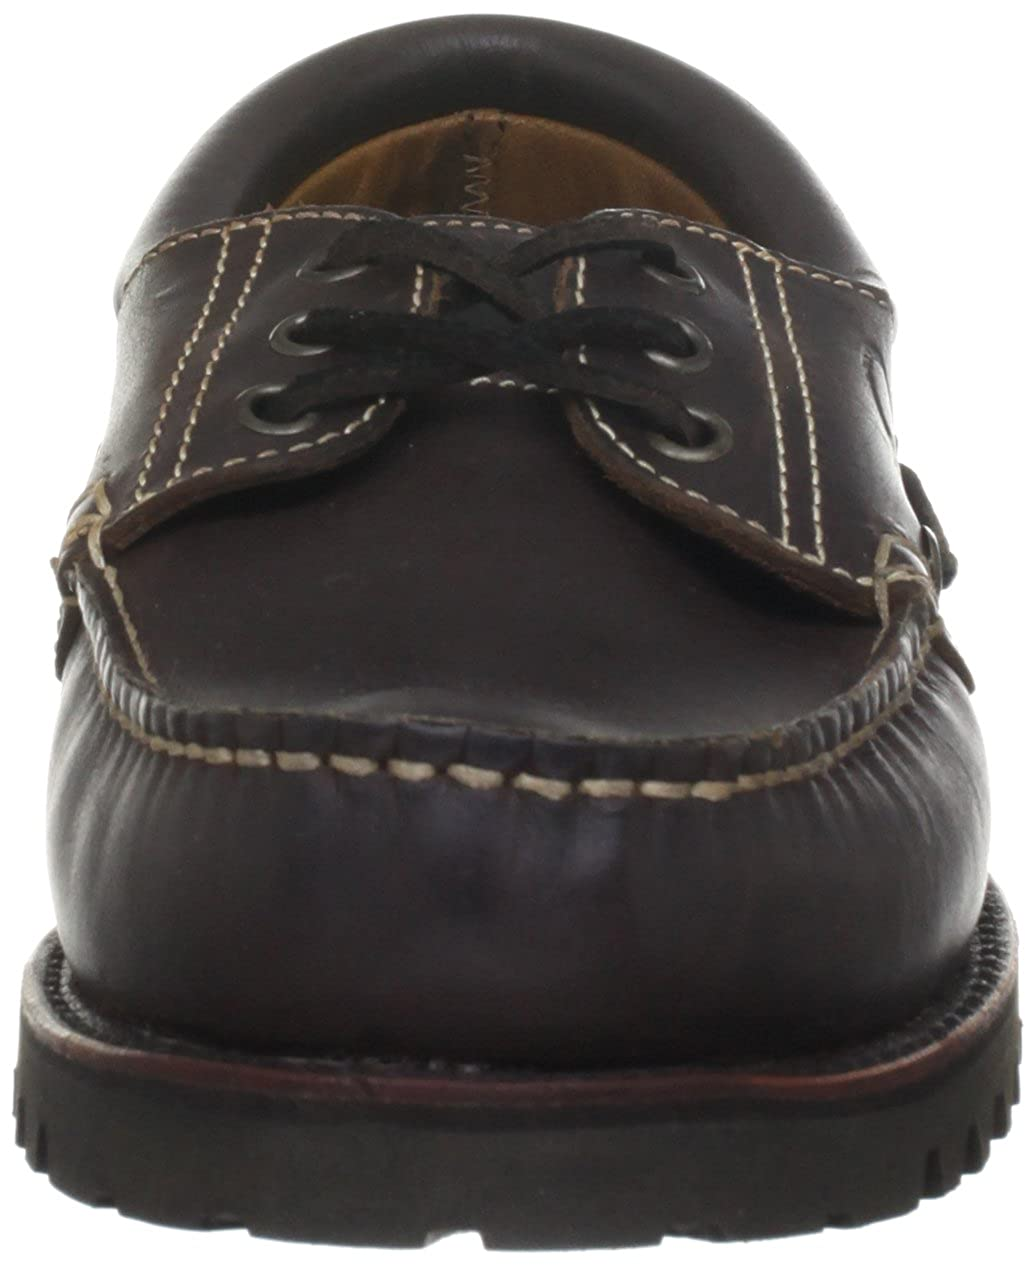 Chatham Marine Darwin Braun Wp, Herren Sneaker Braun Darwin (Dark Braun) fc8986